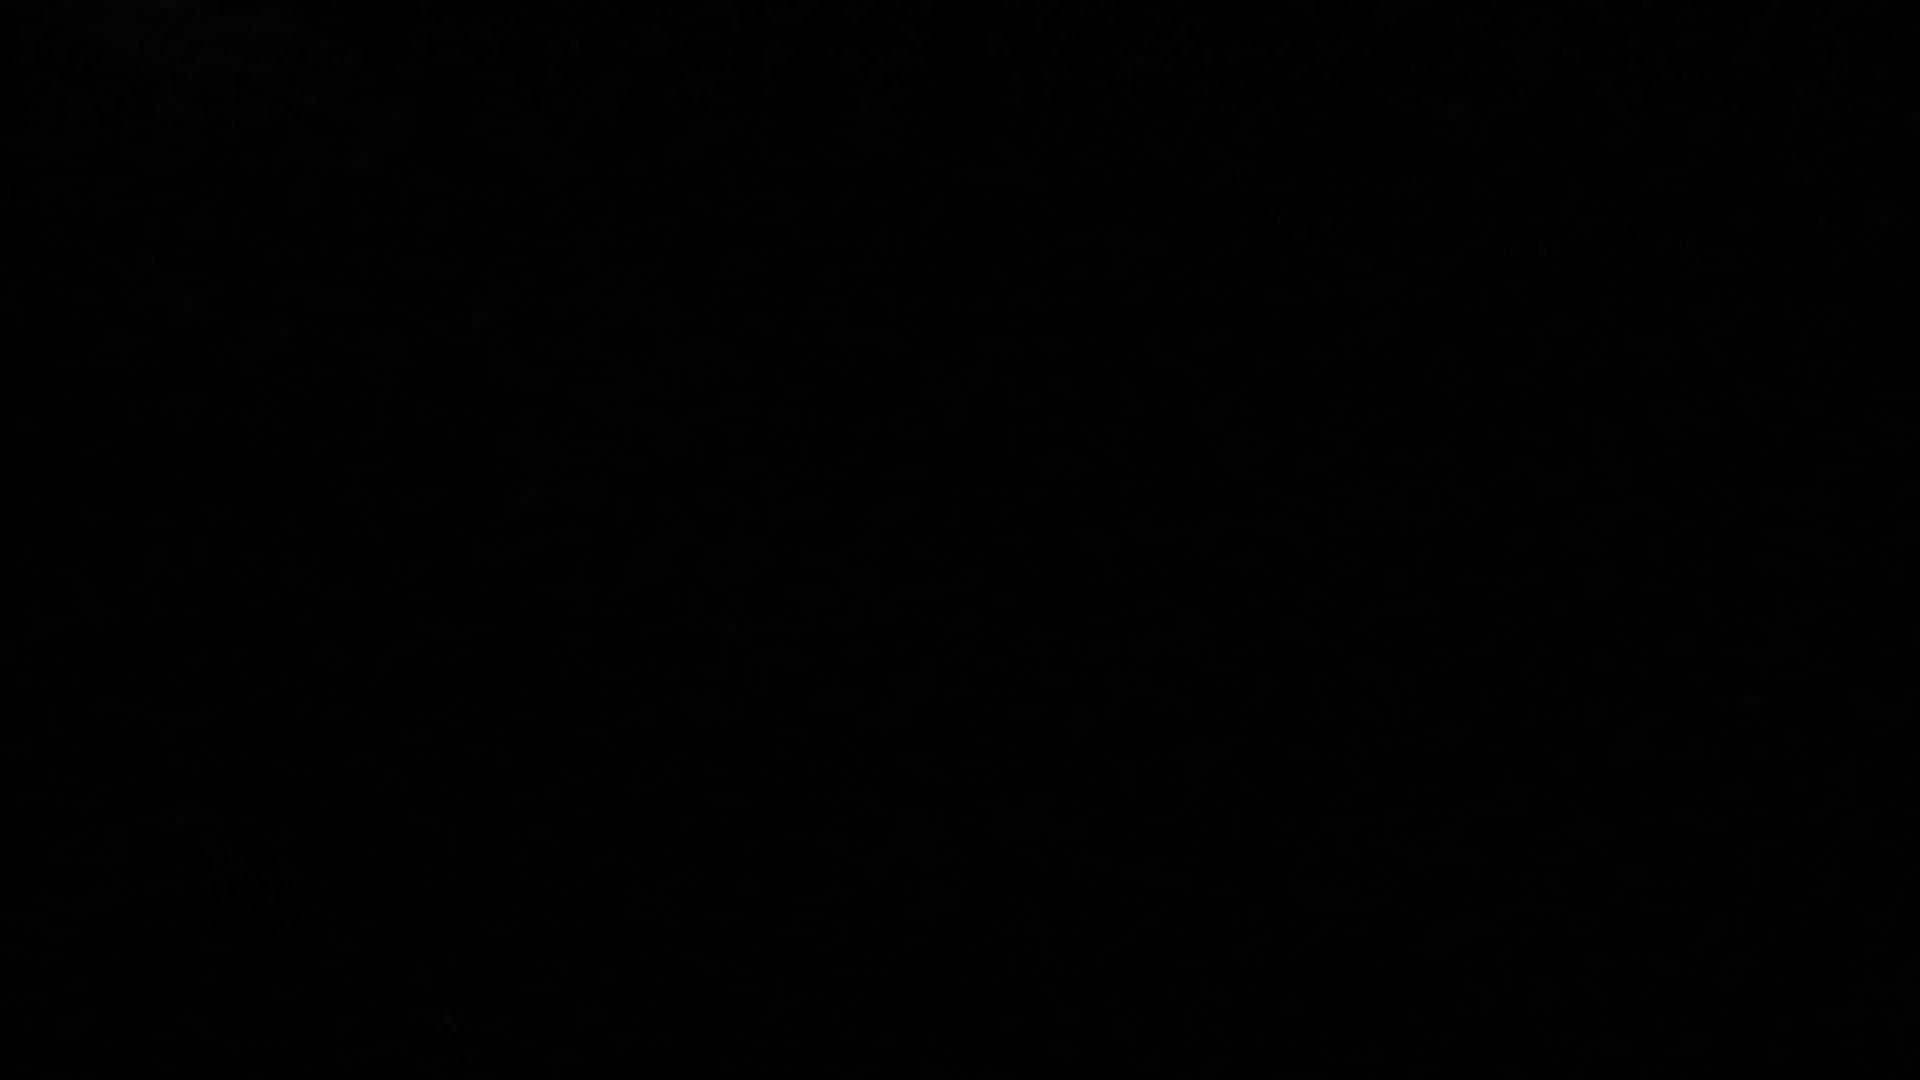 SPYさん初投稿!マンション覗き!5000K!ハイビジョン撮影VOL.01(現役野球部大学生編) スポーツマン男子 ゲイアダルト画像 95枚 24